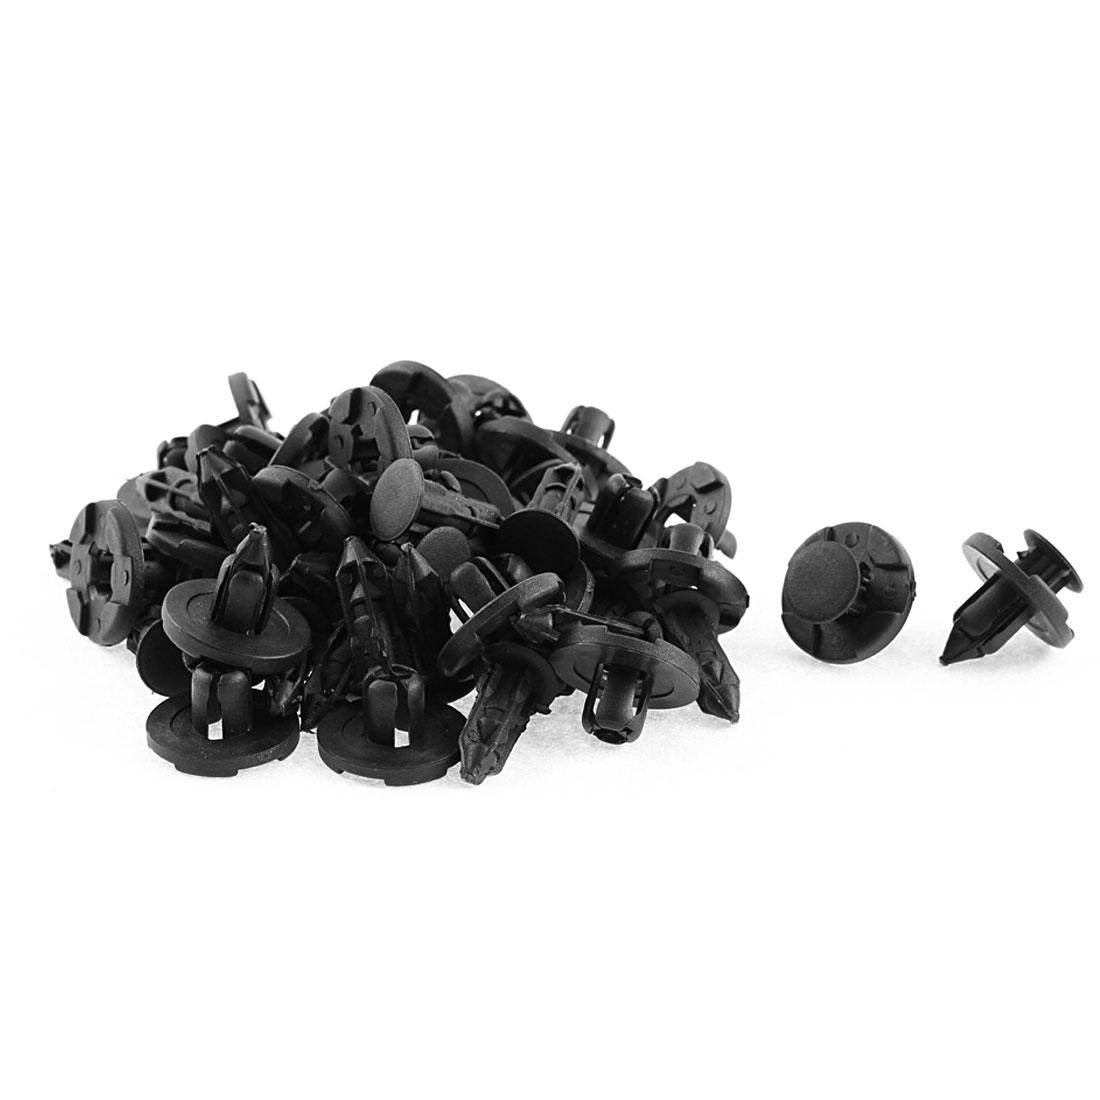 30 Pcs Black Plastic Rivet Bumper Lining Moulding Mat Clips for Nissan Teana Tiida